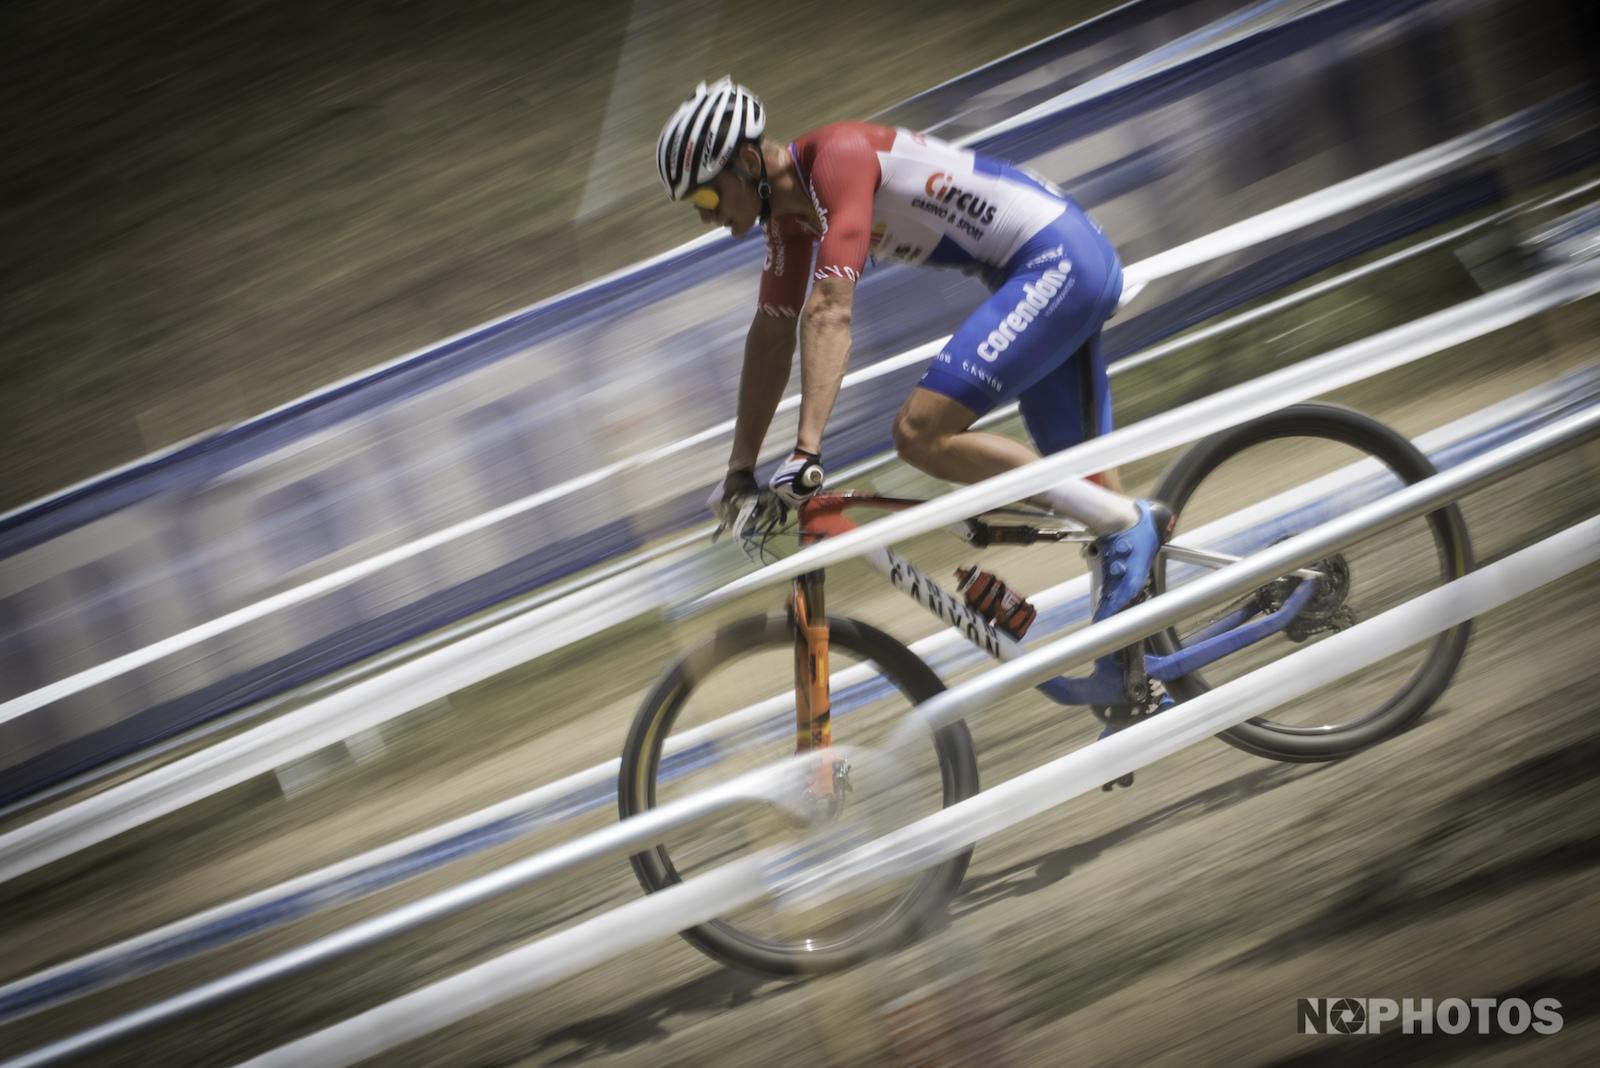 Panshot UCI World Cup XC Les Gets 2019 - Mathieu van der Poel olivierdevise